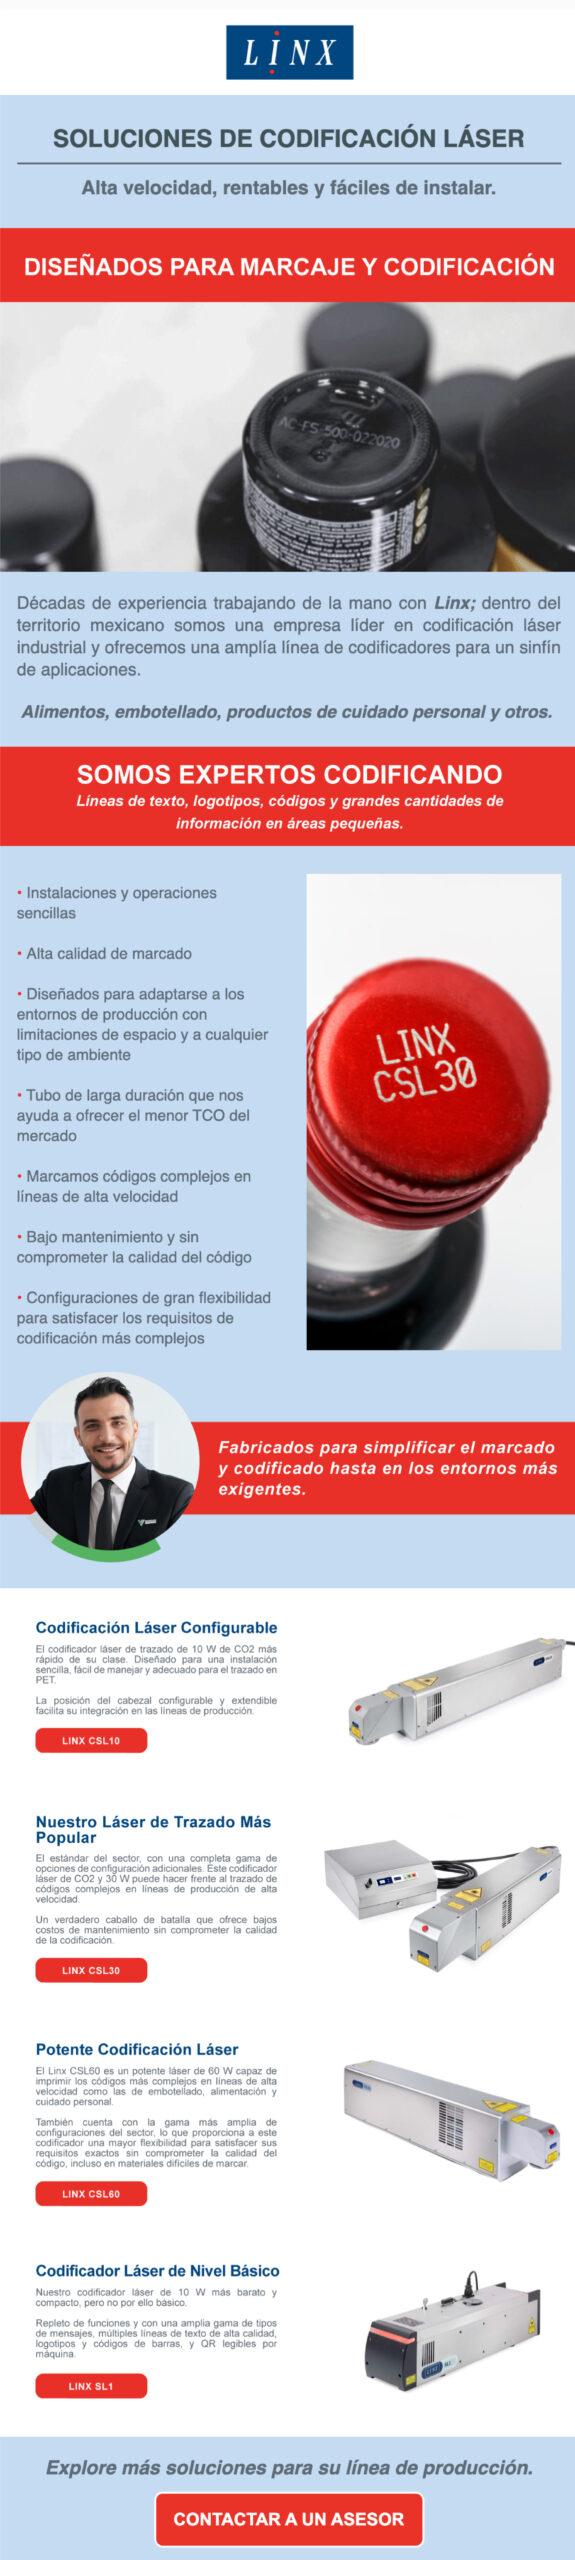 Codificadores láser Linx